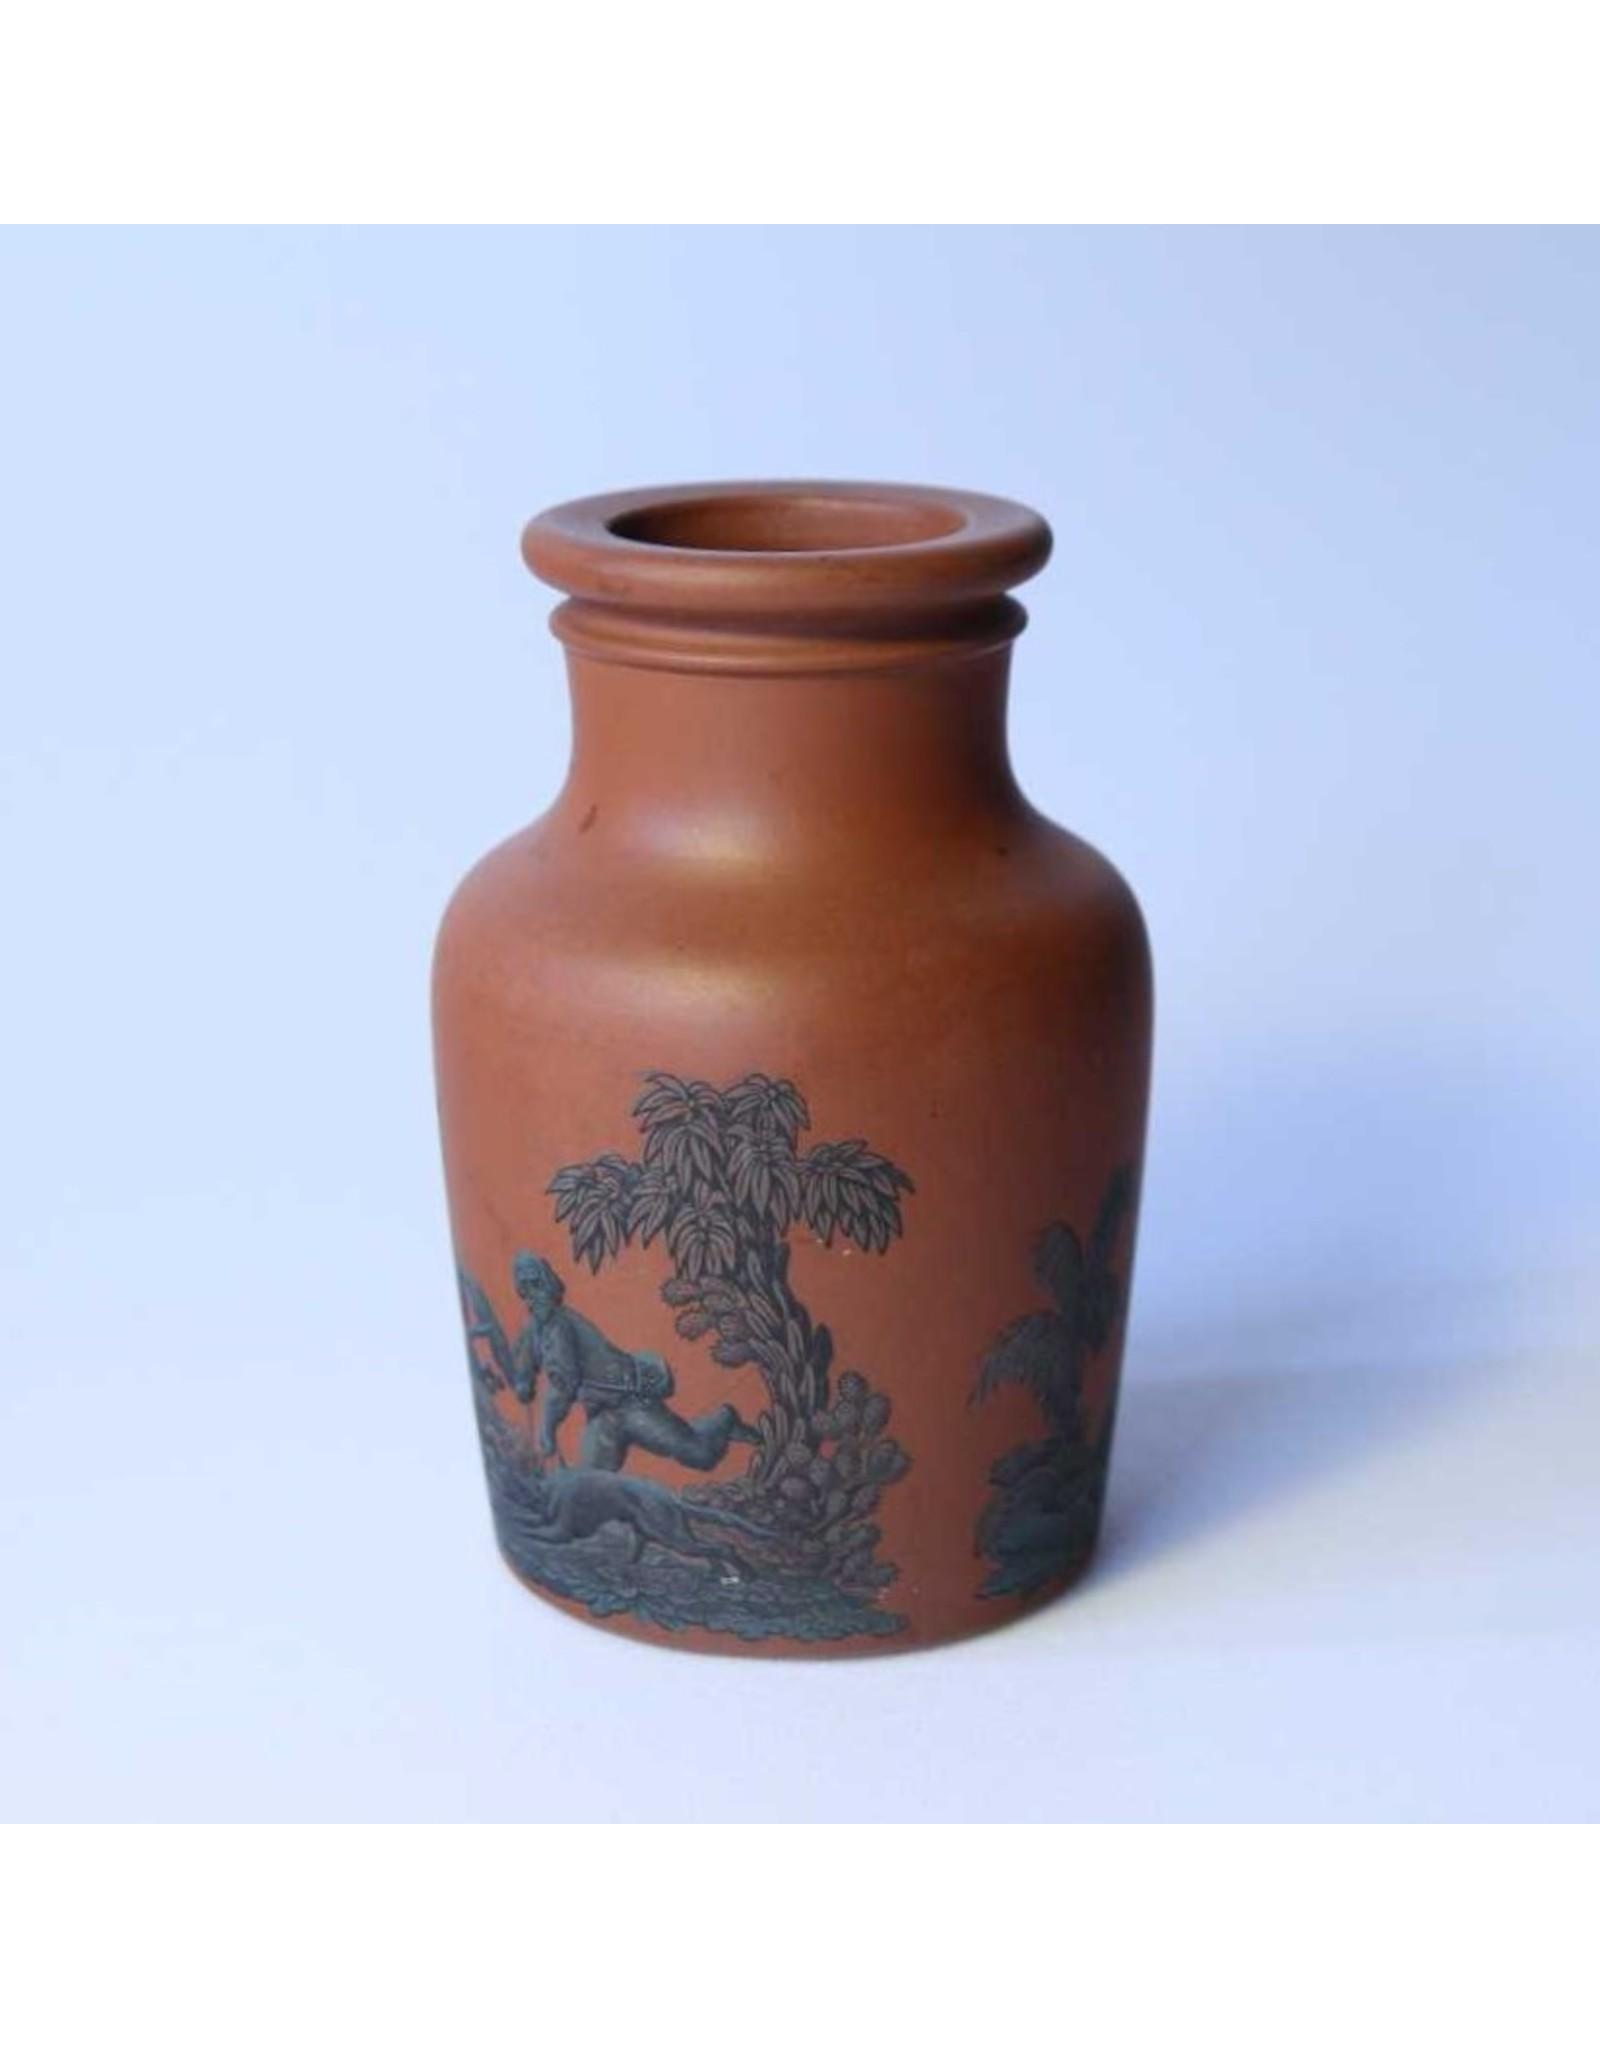 Prattware meat paste jar, terracotta, circa 1860